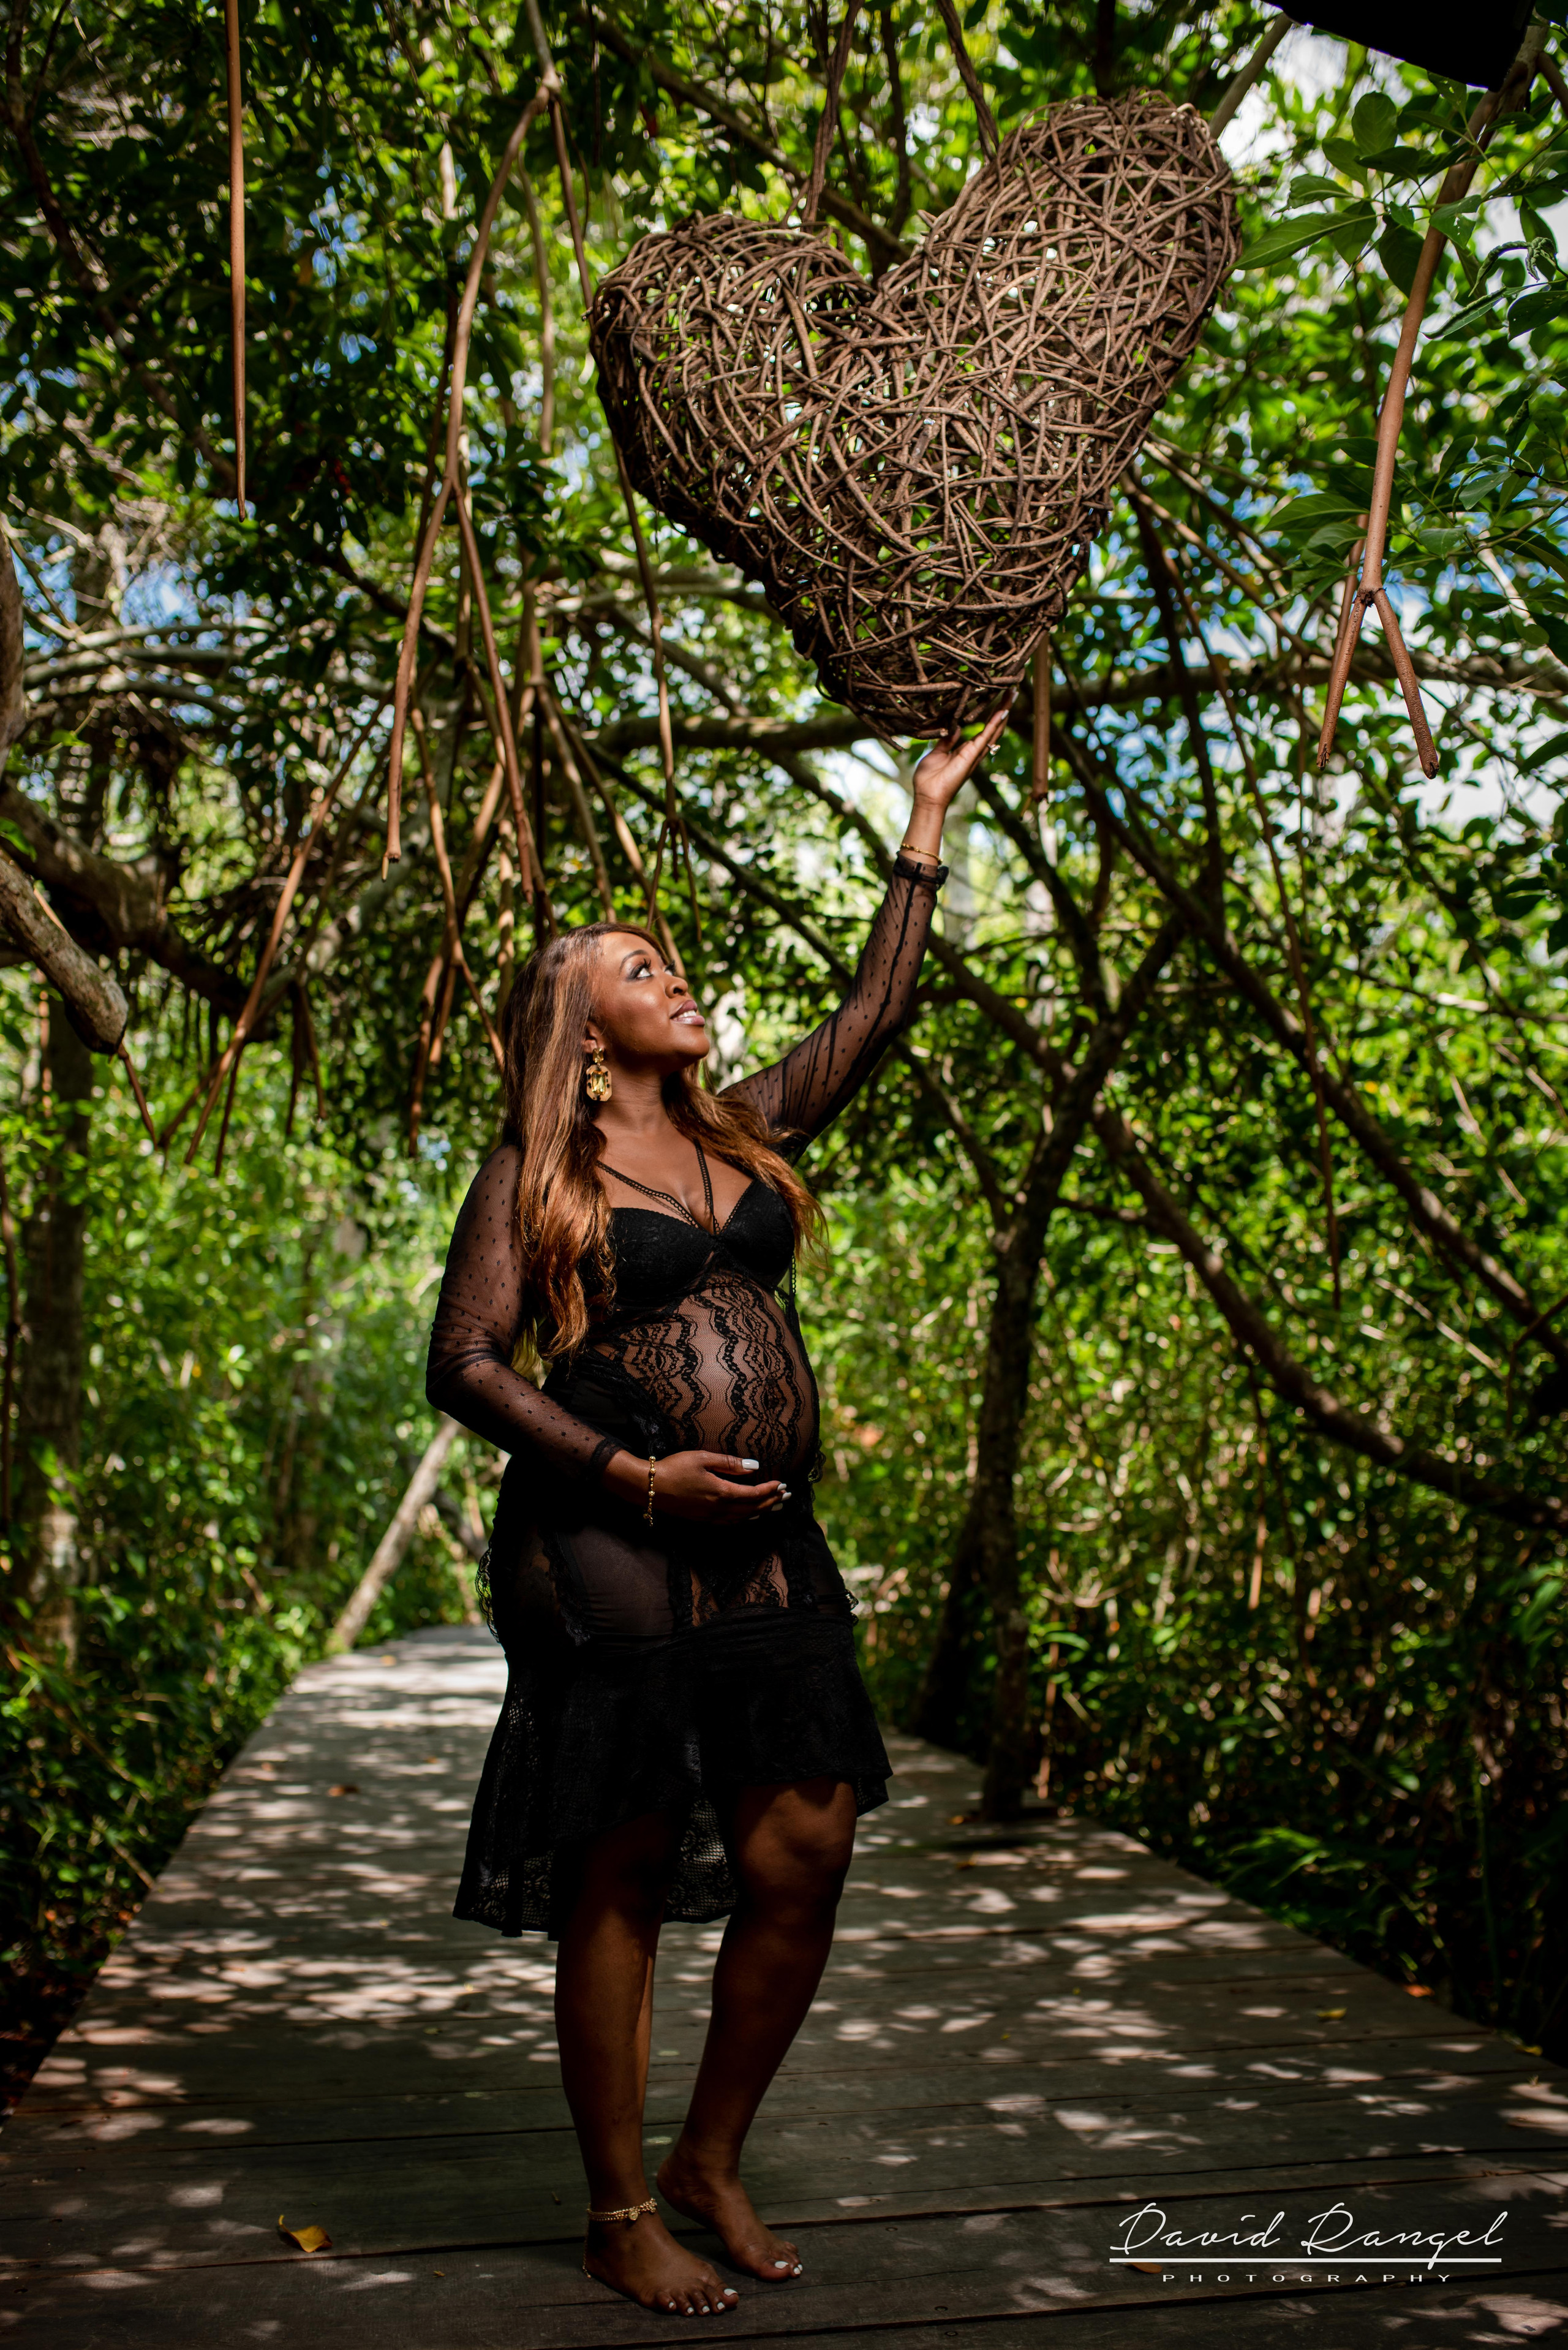 maternity+pregnancy+photo+session+photographer+photography+laguna+kaan+luum+tulum+riviera+maya+destination+photosession+nature+heart+pier+trees+woman+girl+momtobe